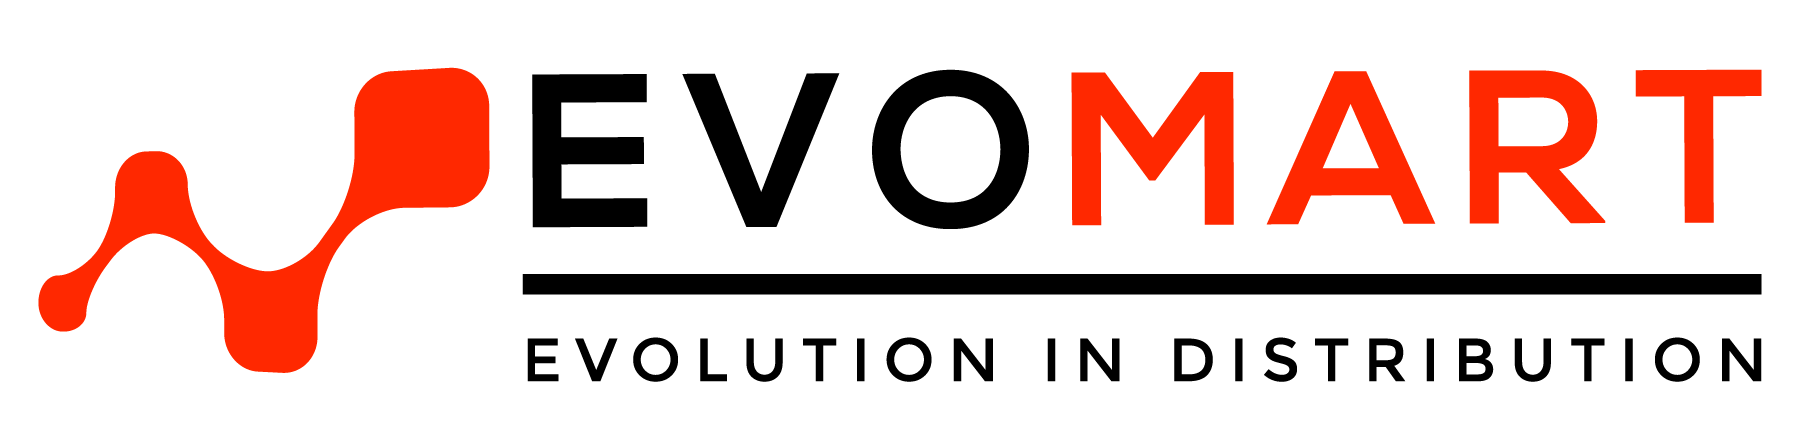 Evomart